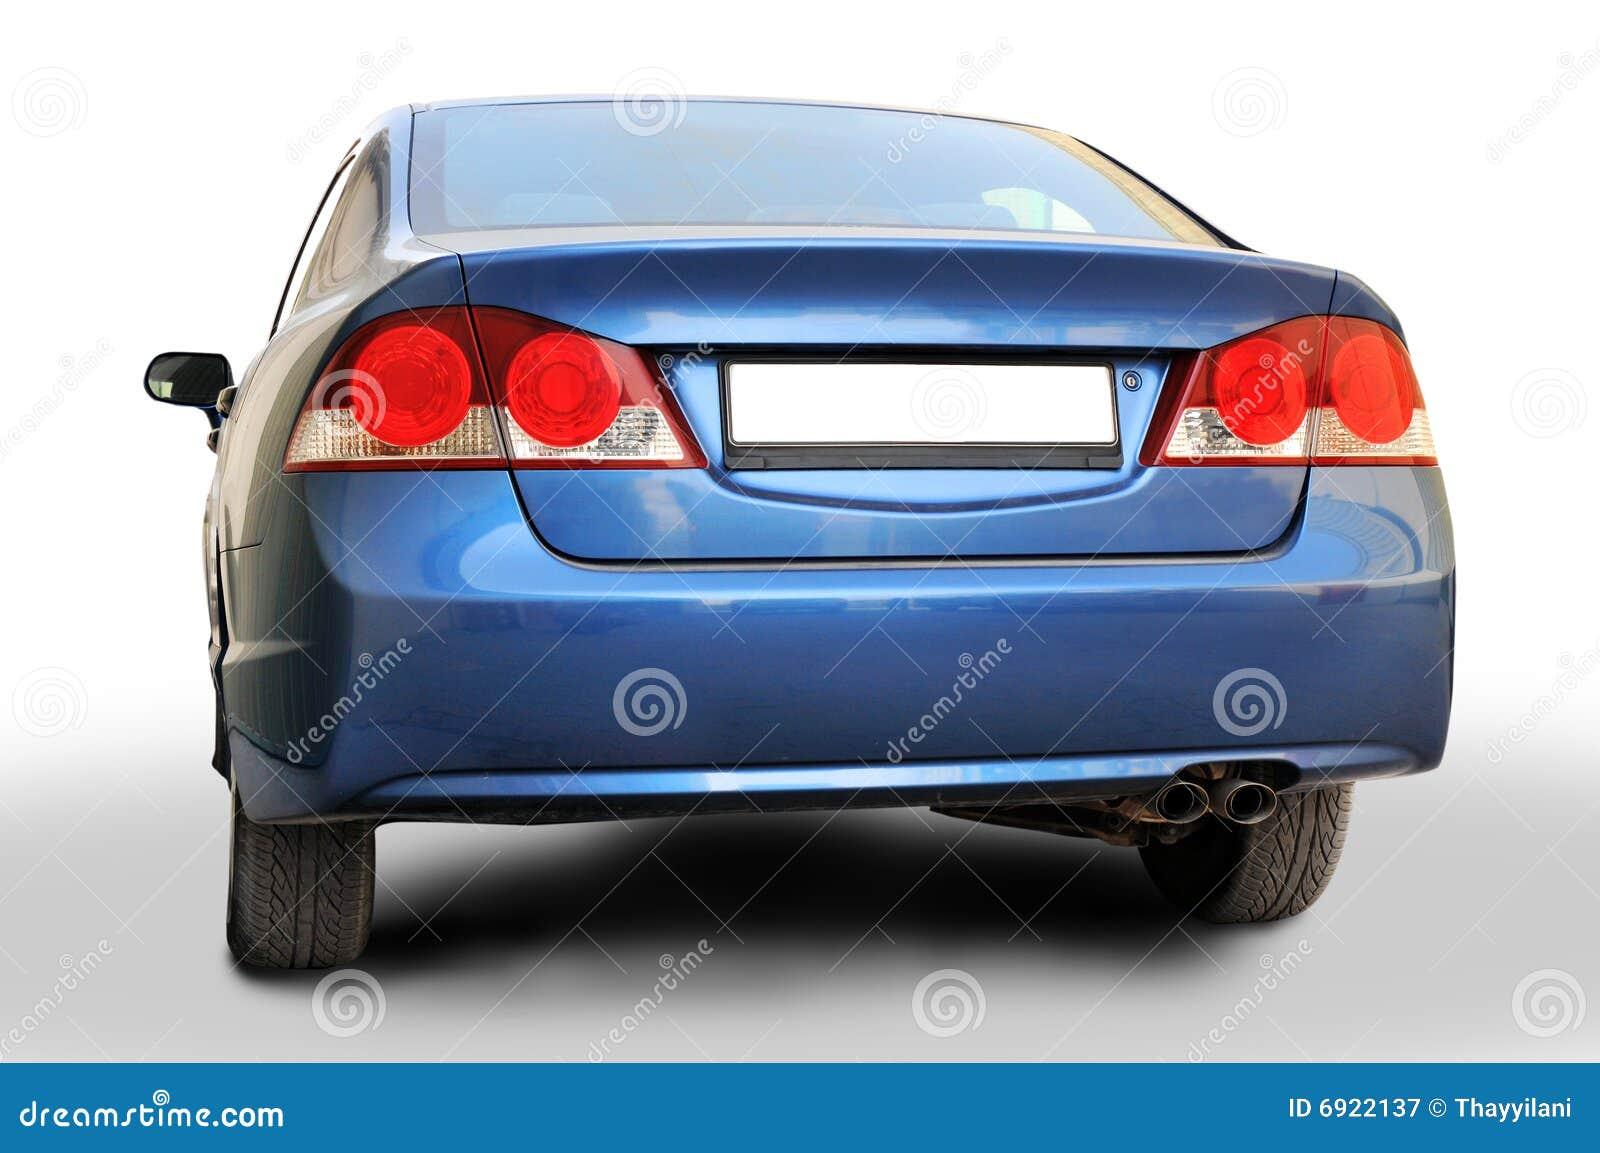 Honda Civic - posterior